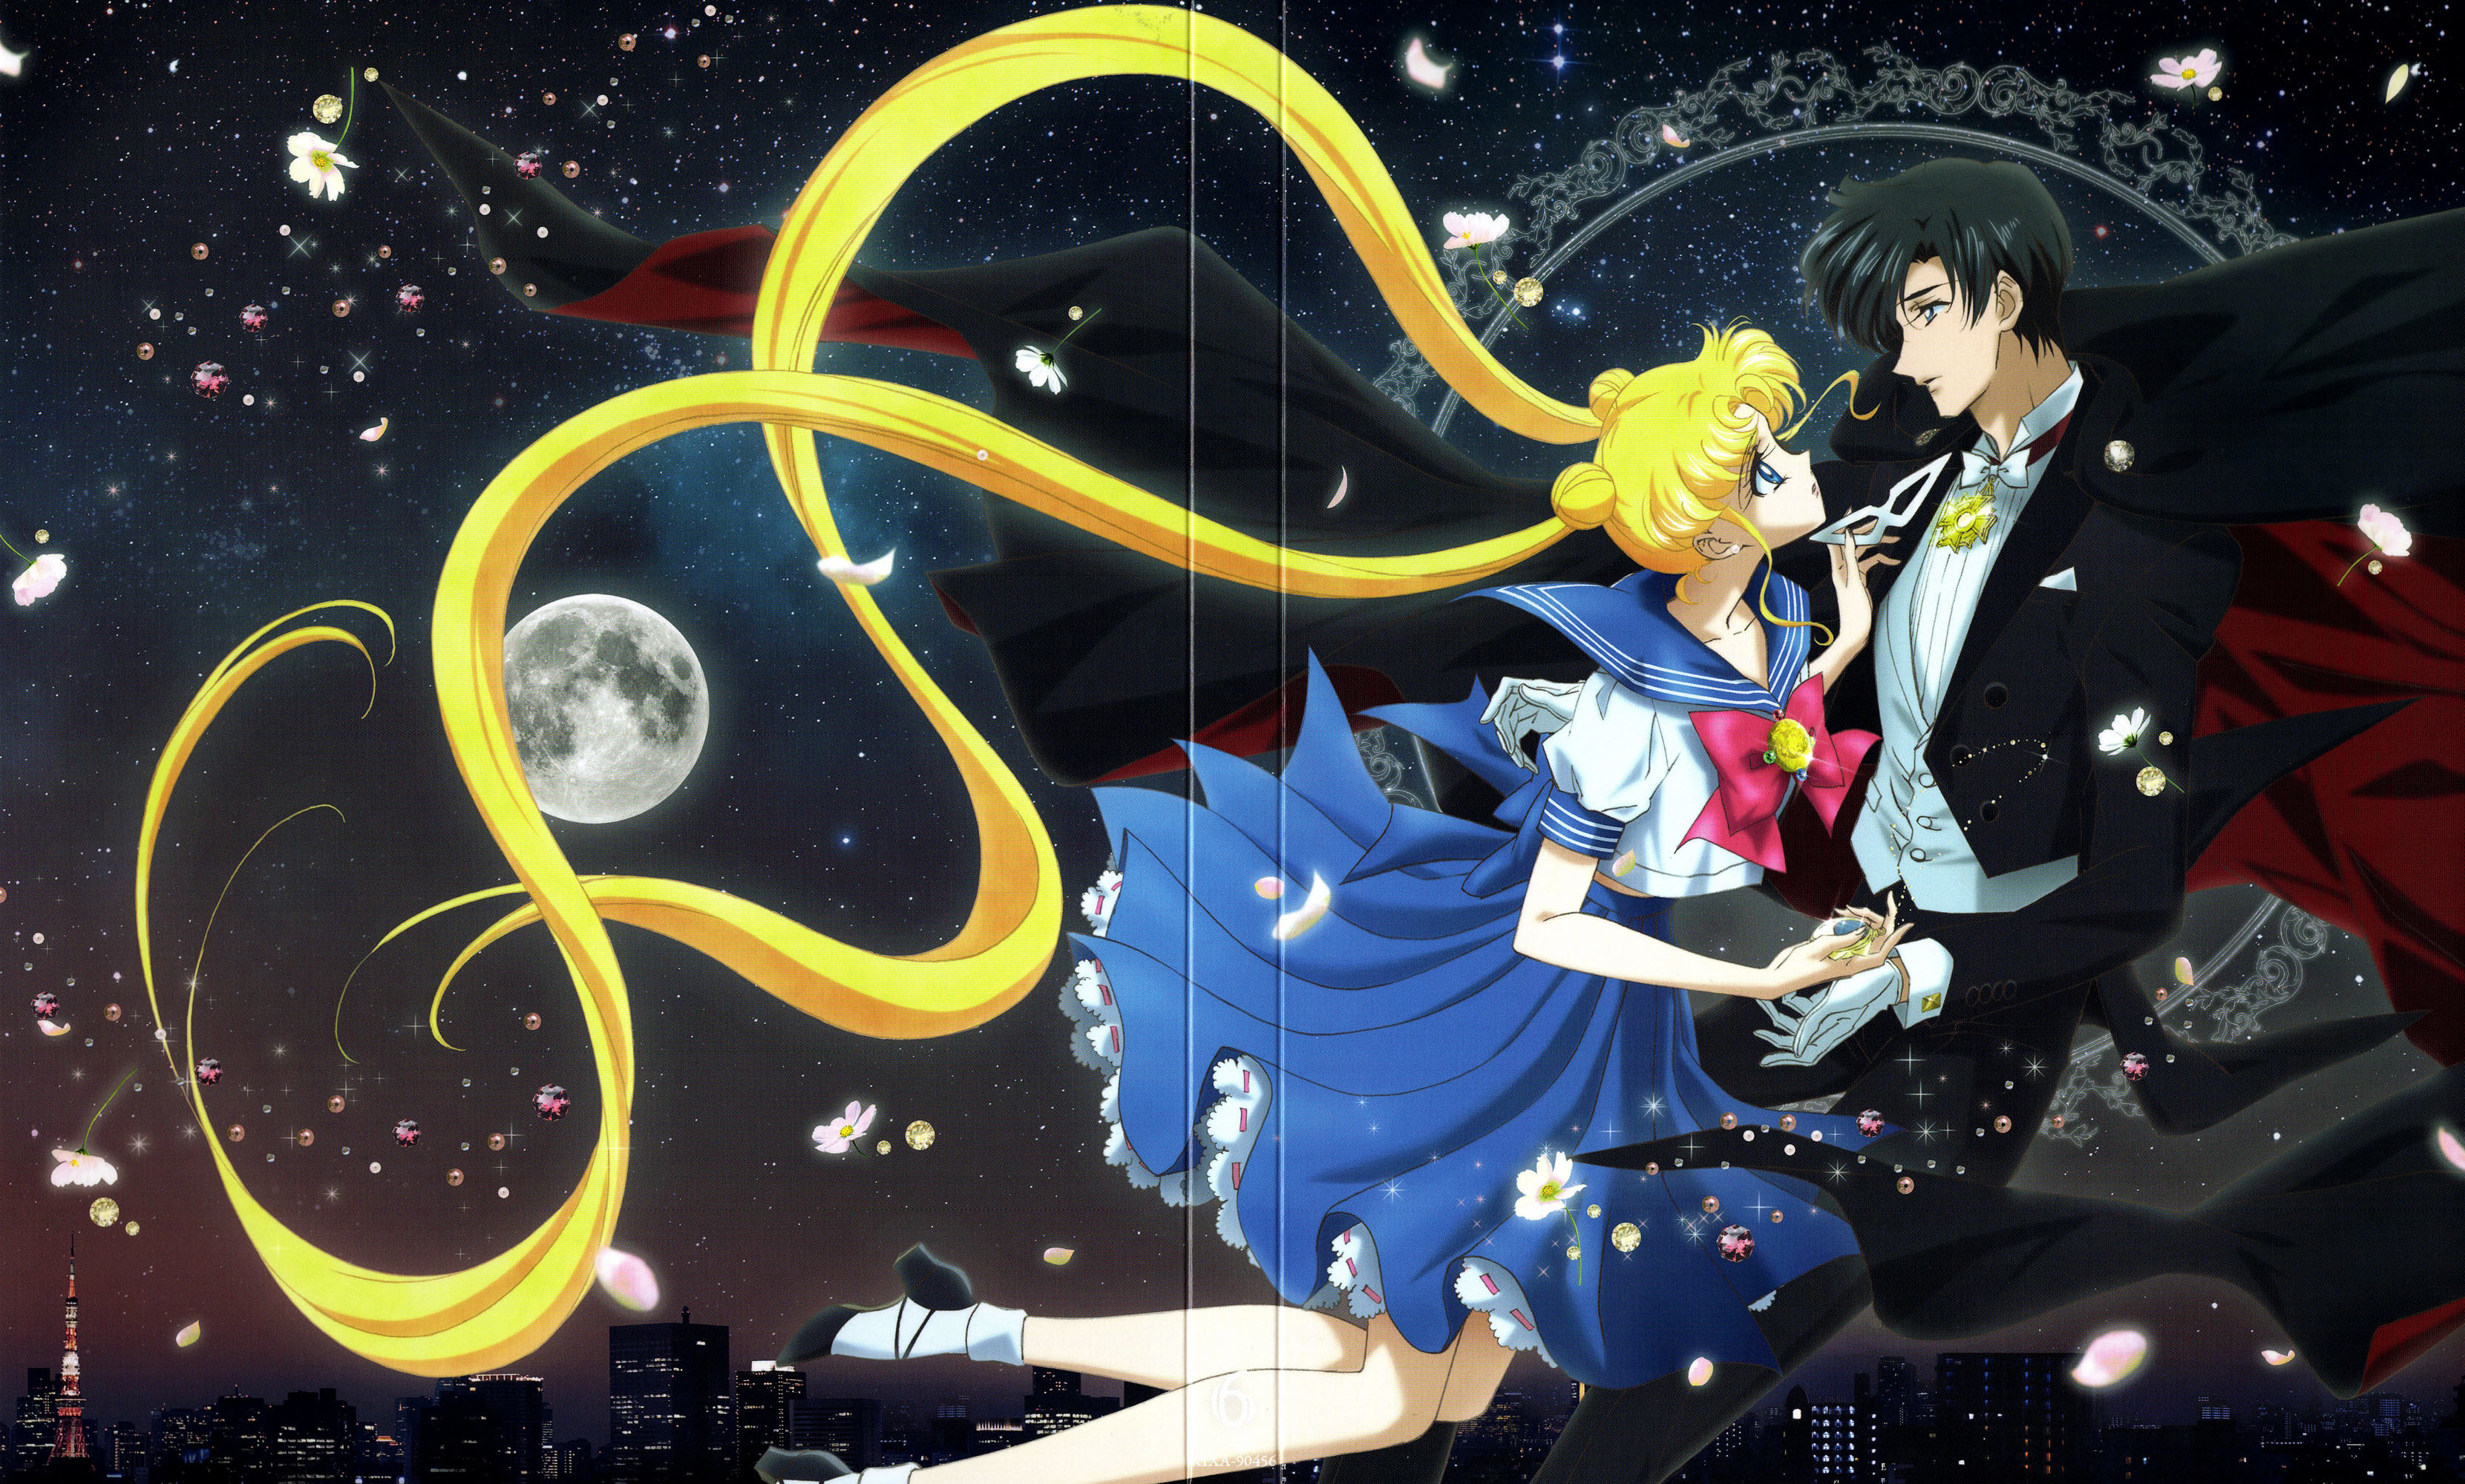 Sailor Moon Wallpaper (82+ Images